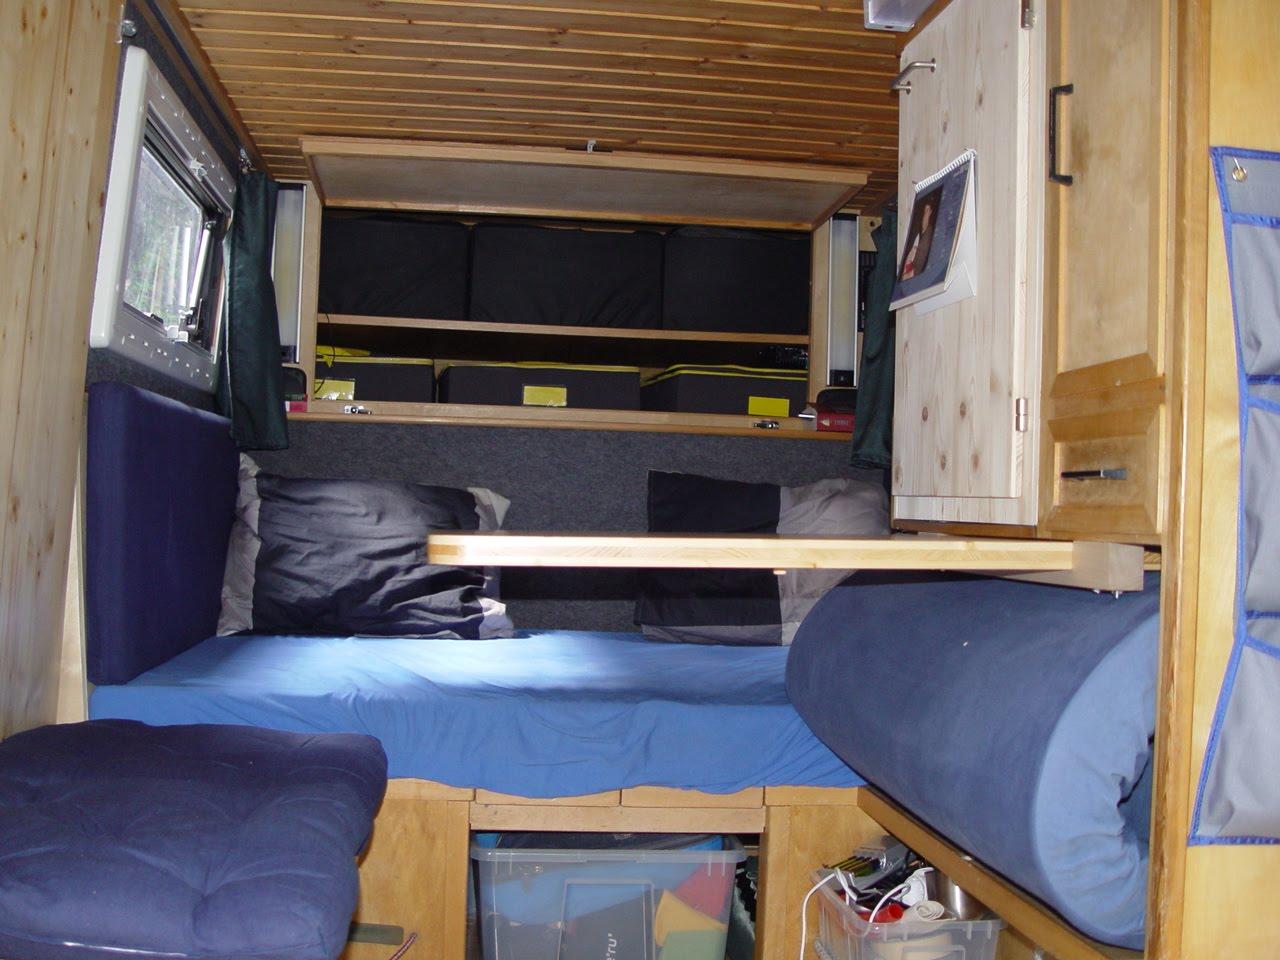 FOR SALE Toyota Hilux Camper in South America